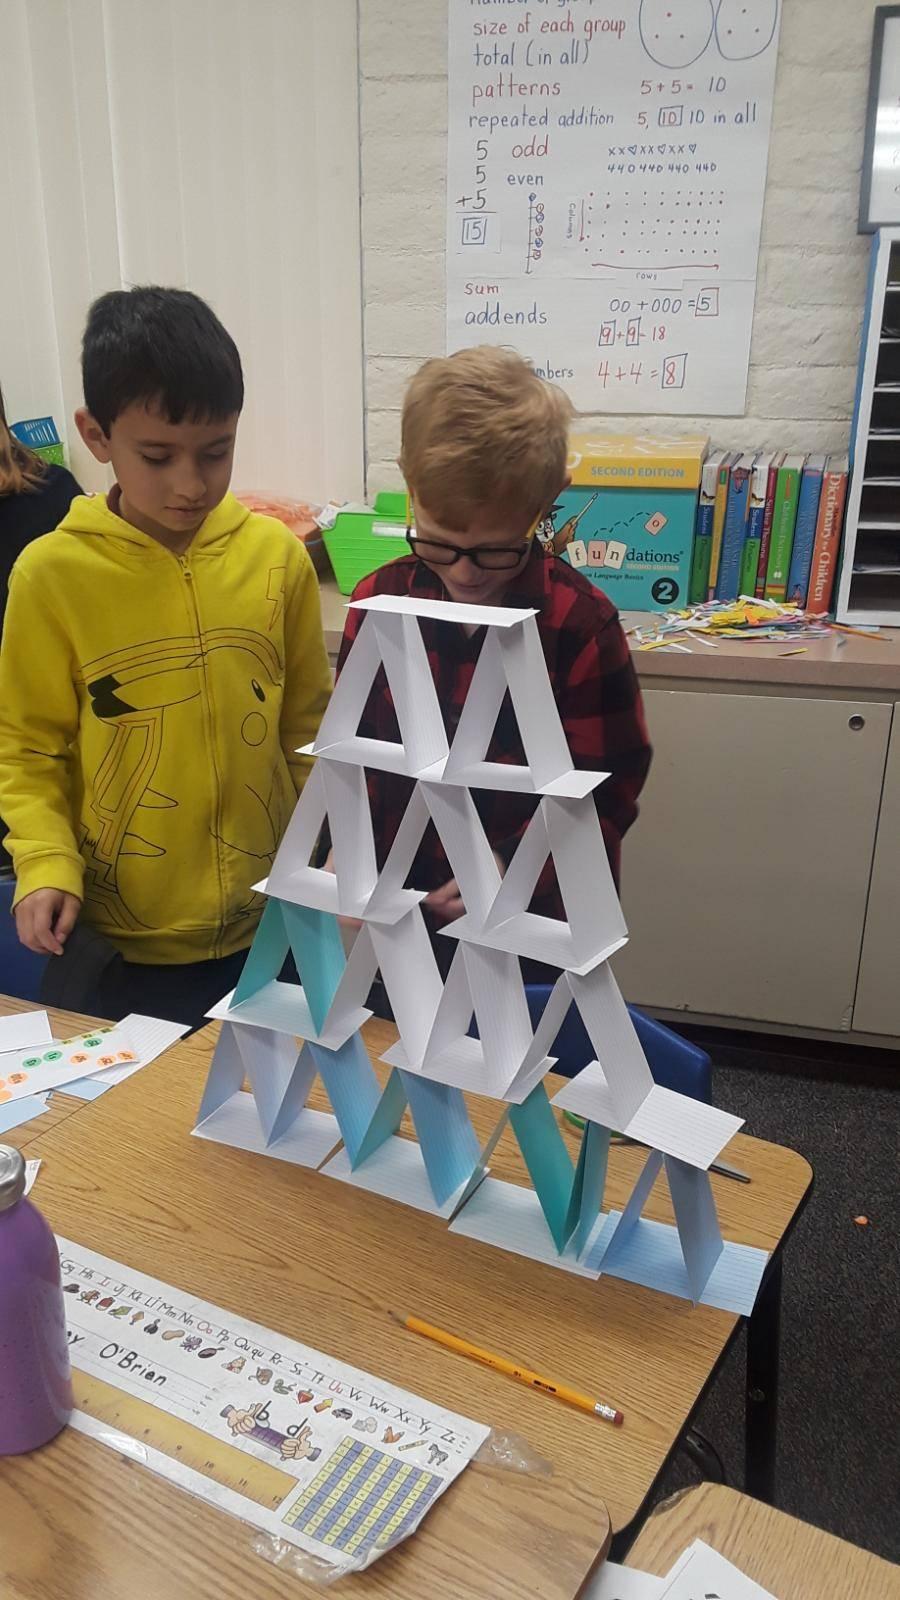 2nd grade boys make an index card structure